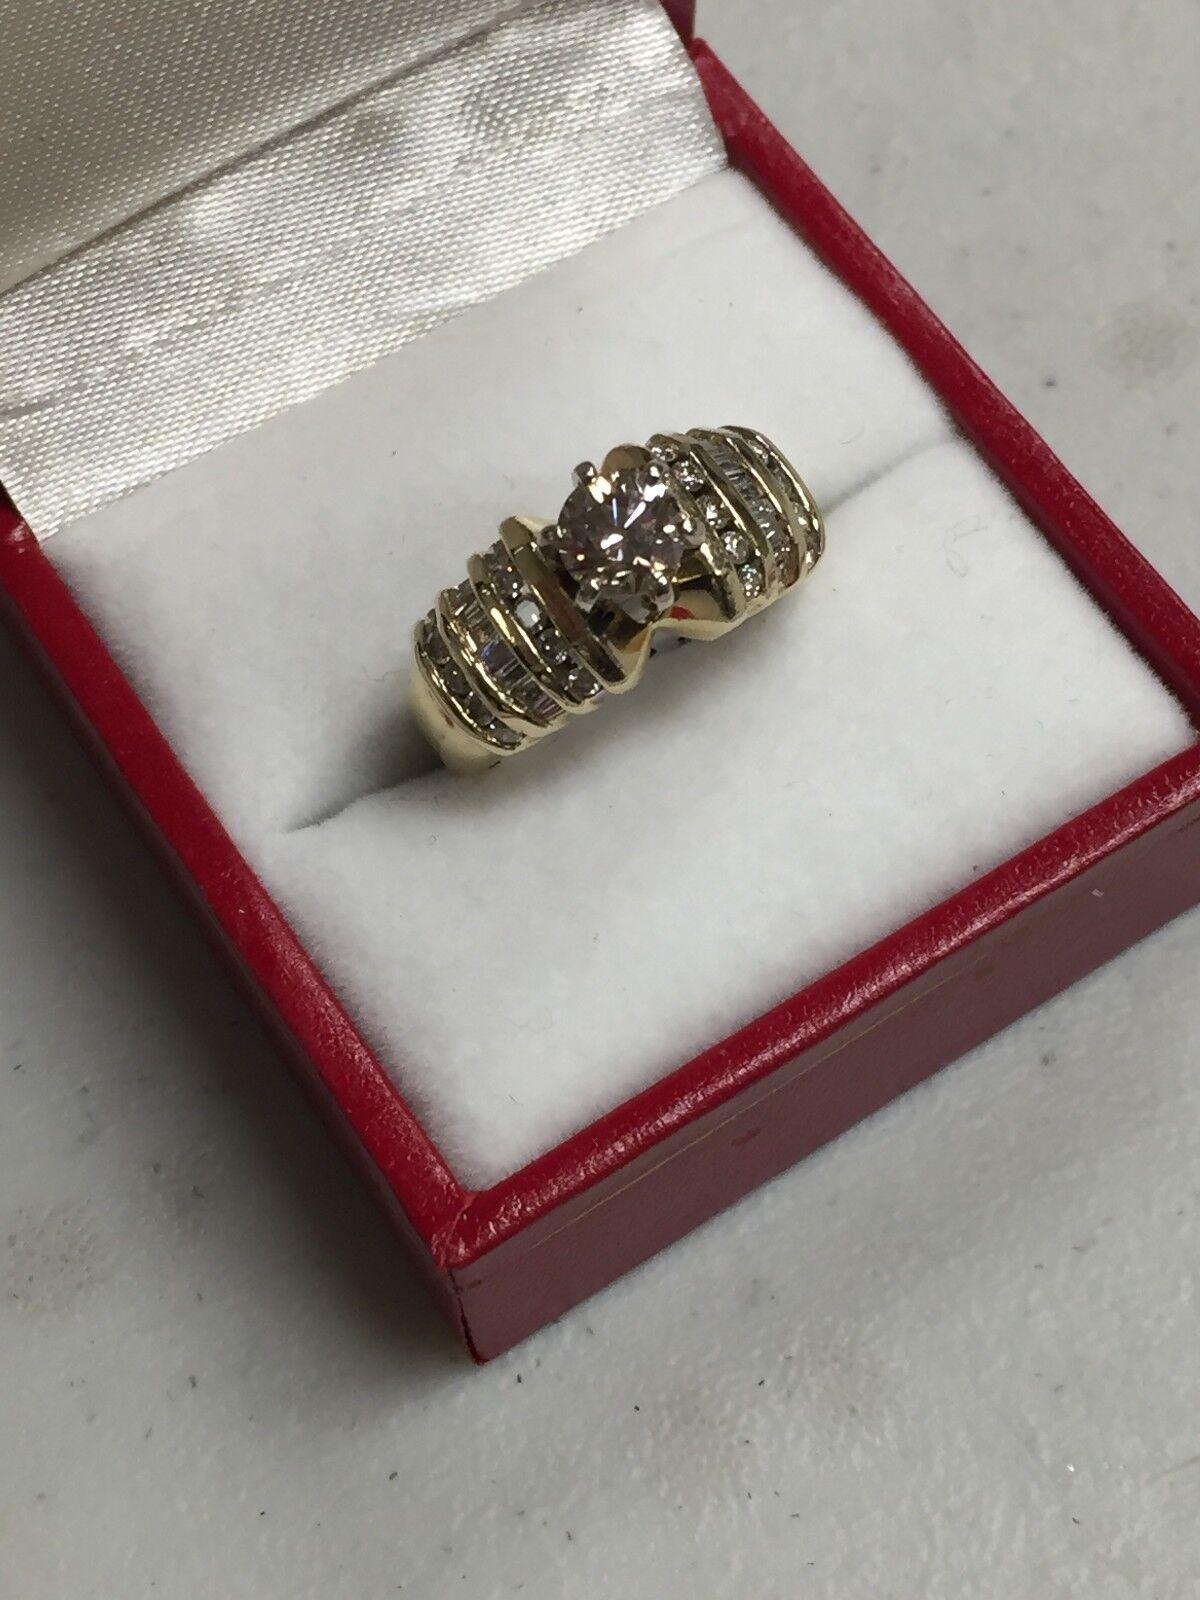 14K YELLOW gold  ROUND DIAMOND 1.32 TCW ENGAGEMENT RING